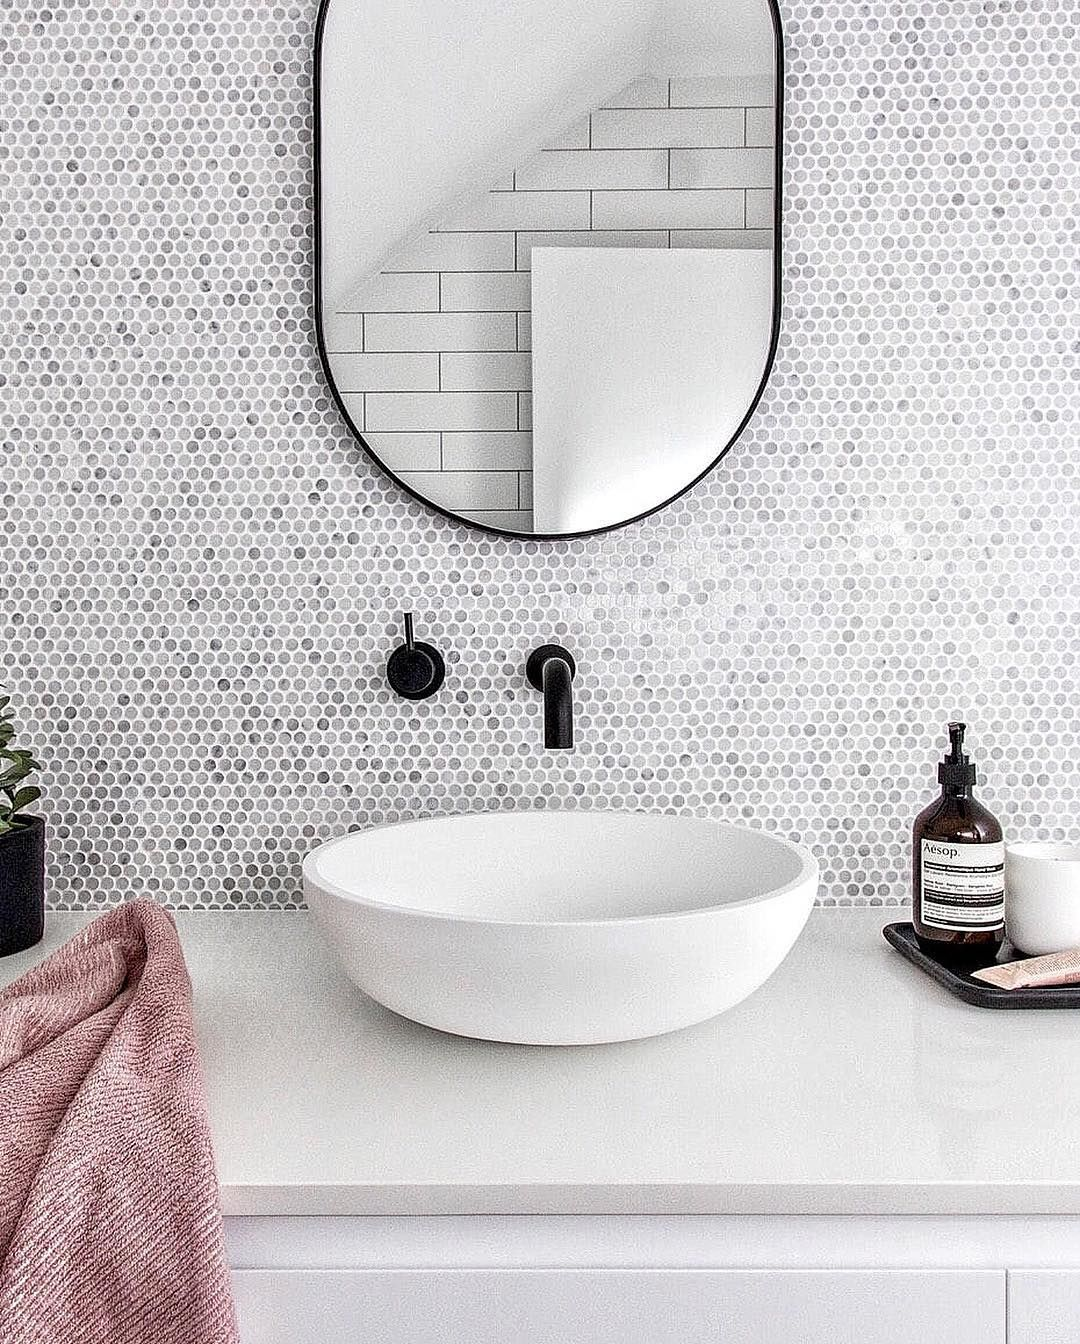 27 Best Bathroom Mirror Ideas For Every Style Oval Mirror Bathroom Round Mirror Bathroom Bathroom Mirror